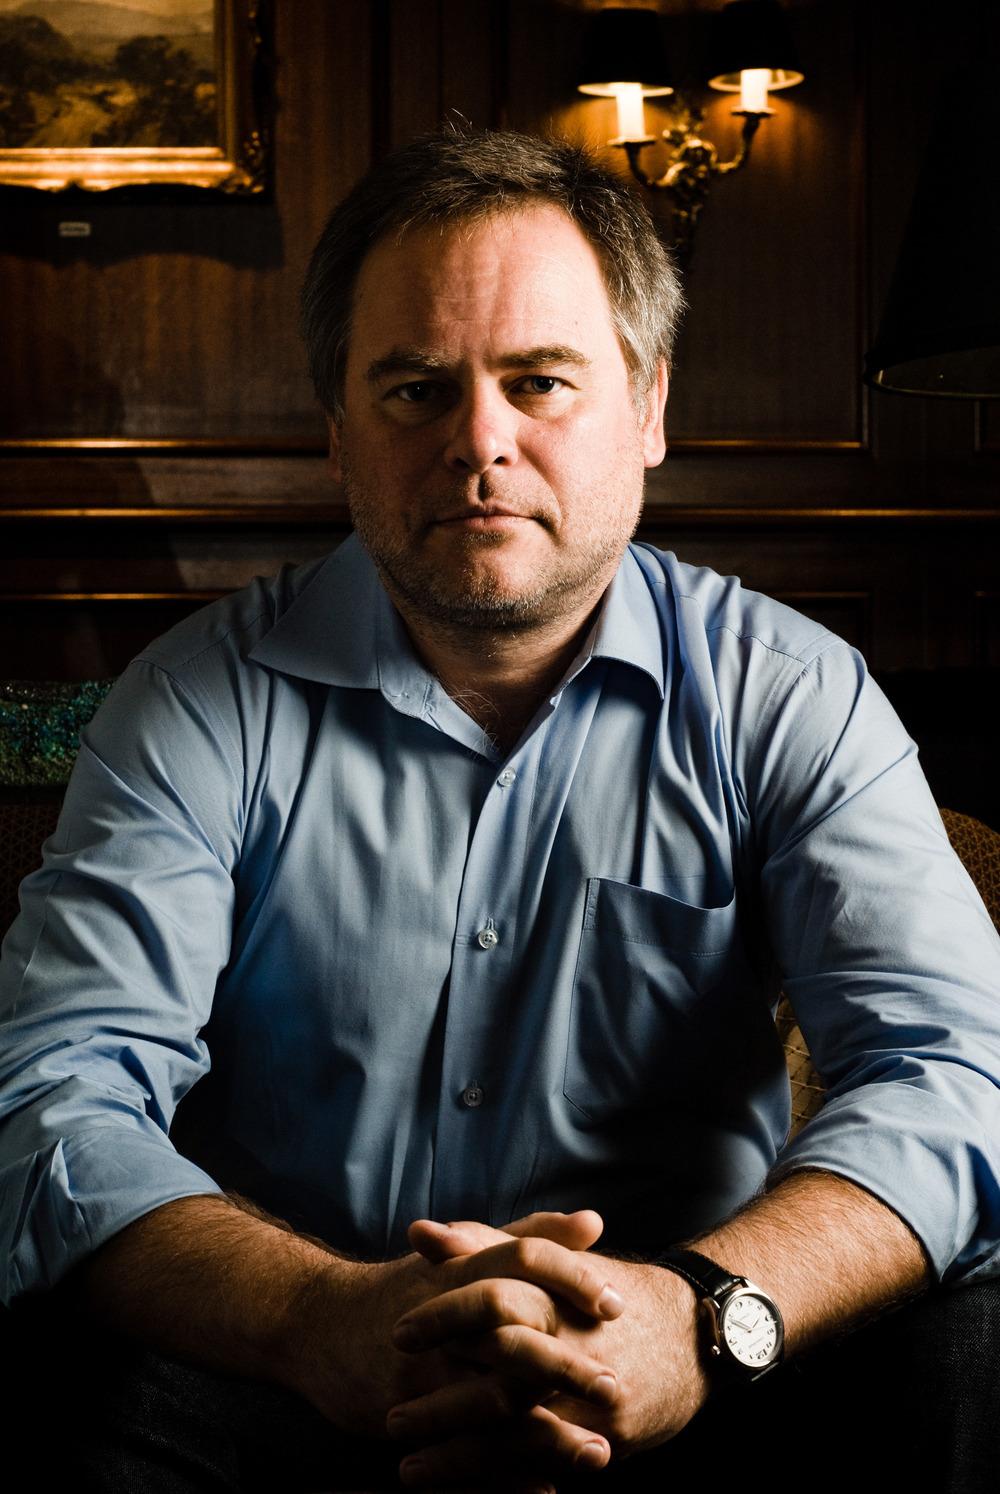 Eugene Kapersky